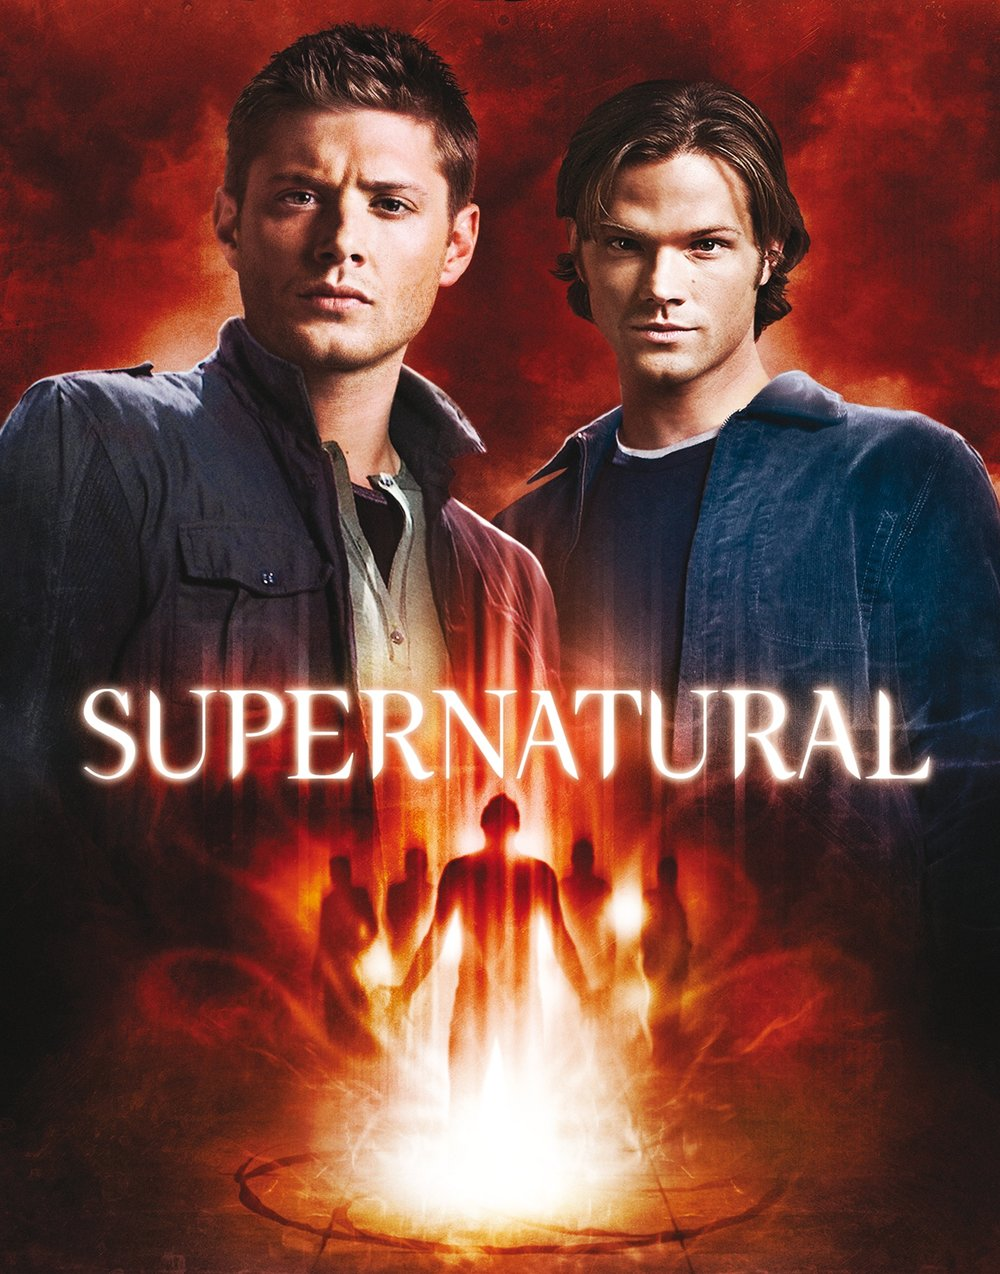 Supernatural_S5_Poster_01.jpeg